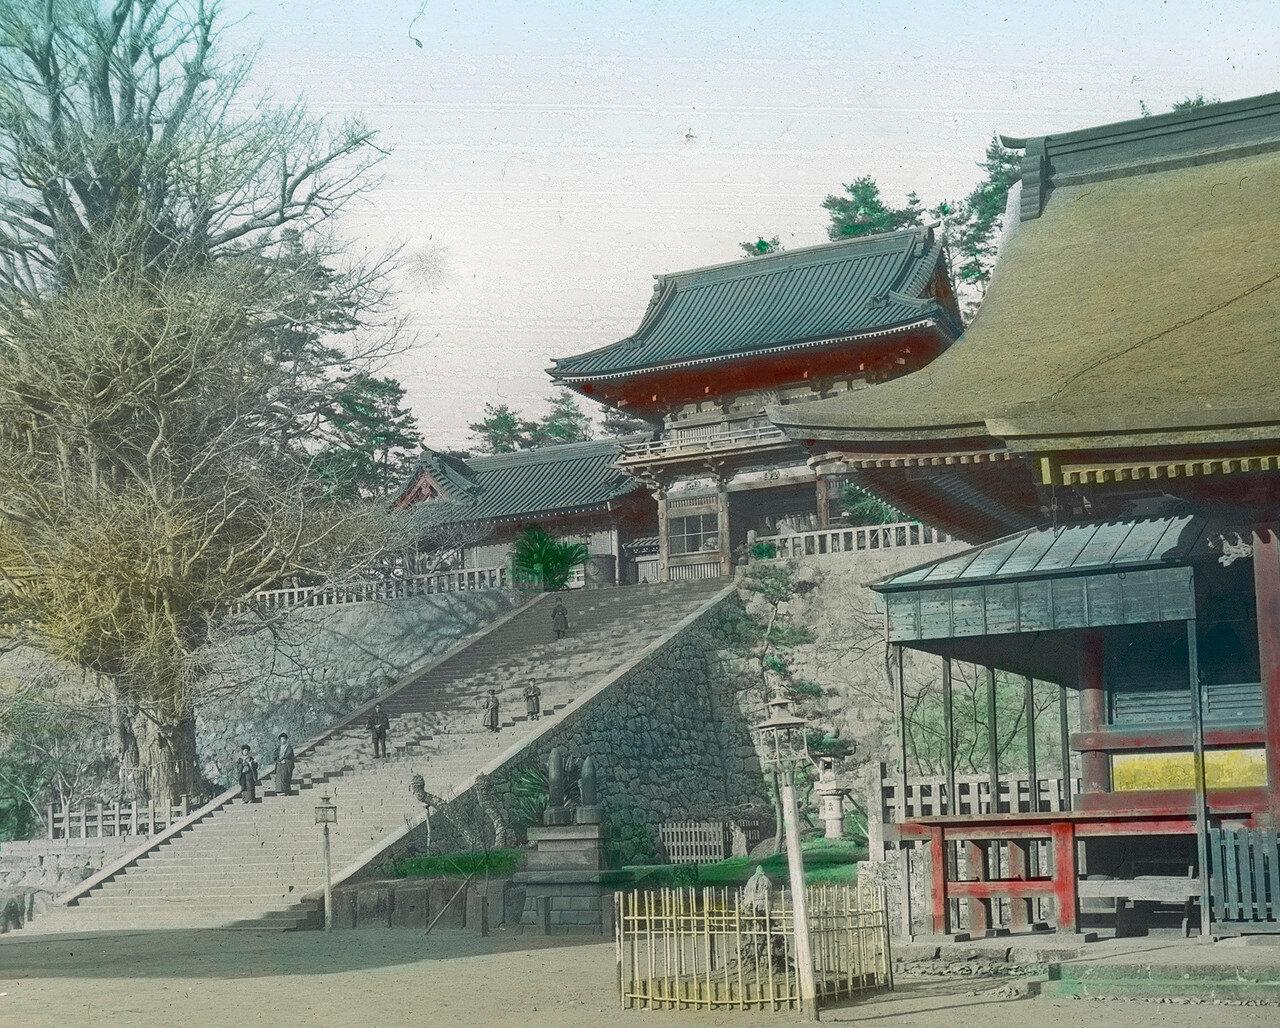 Камакура. Подъем к храму Цуругаока Хатимангу